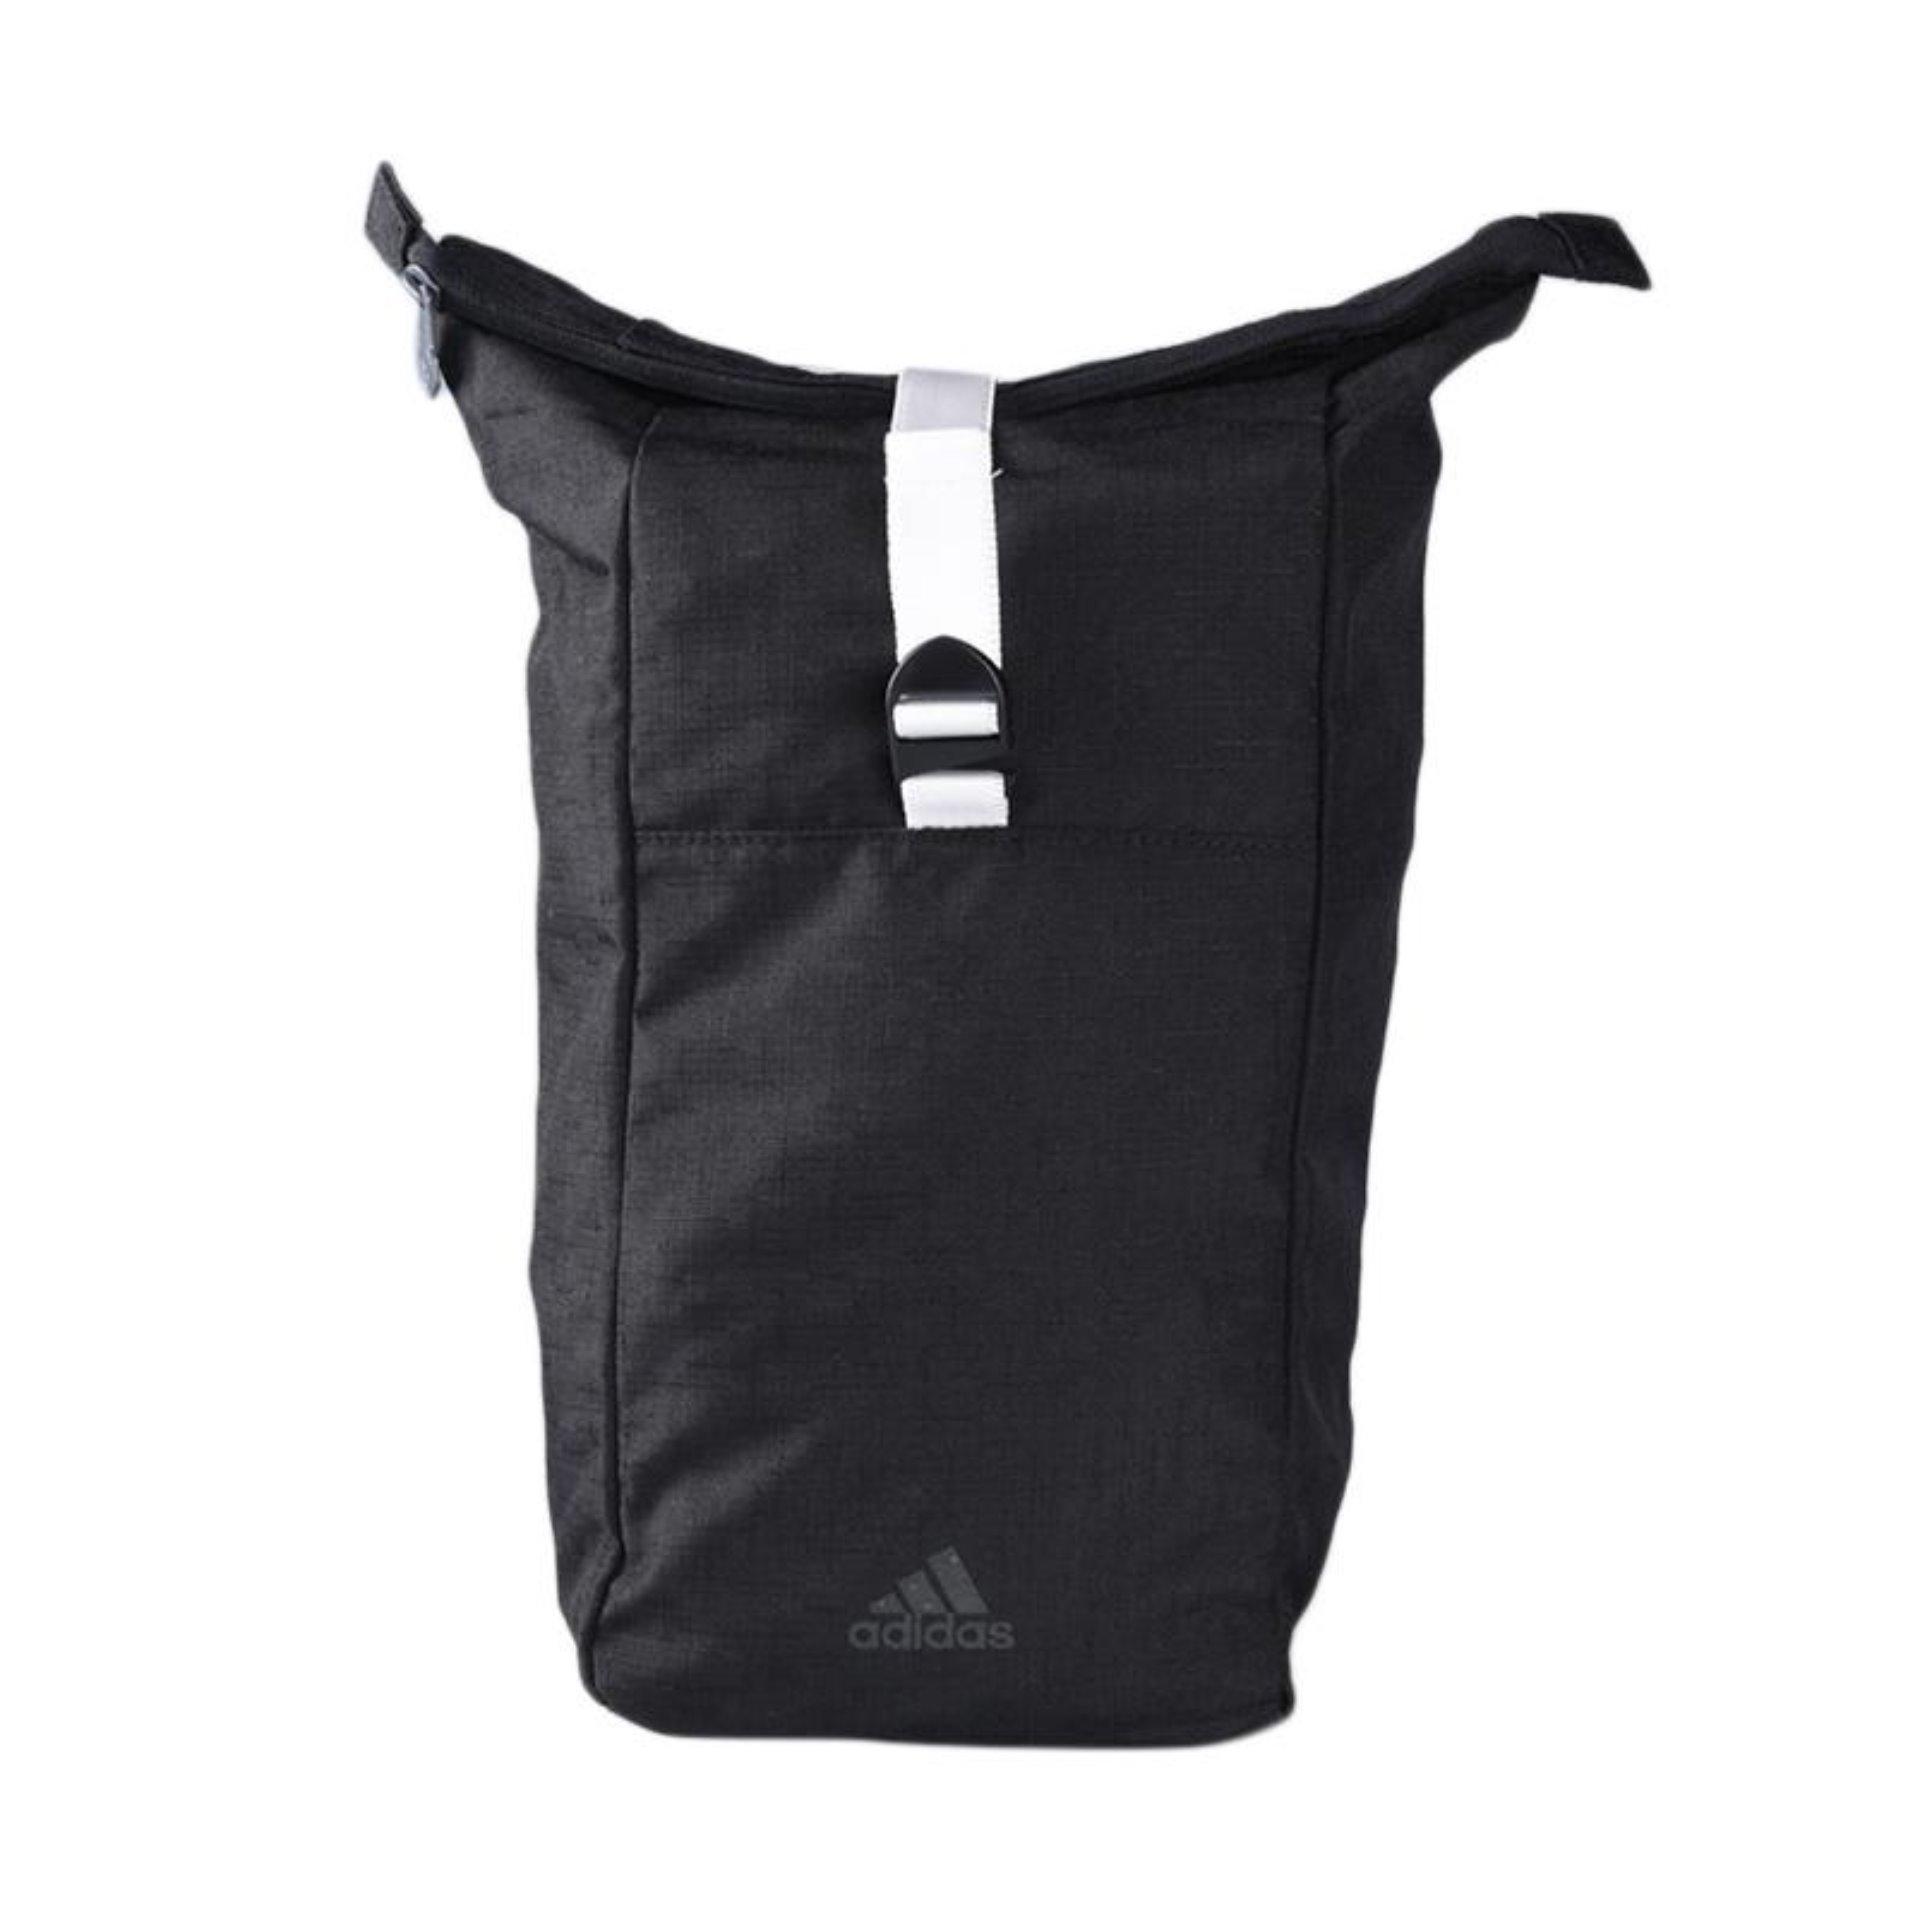 Puma Tas Sepatu Training Shoe Bag 7446302 Navy - Update Daftar Harga ... bed67f2410